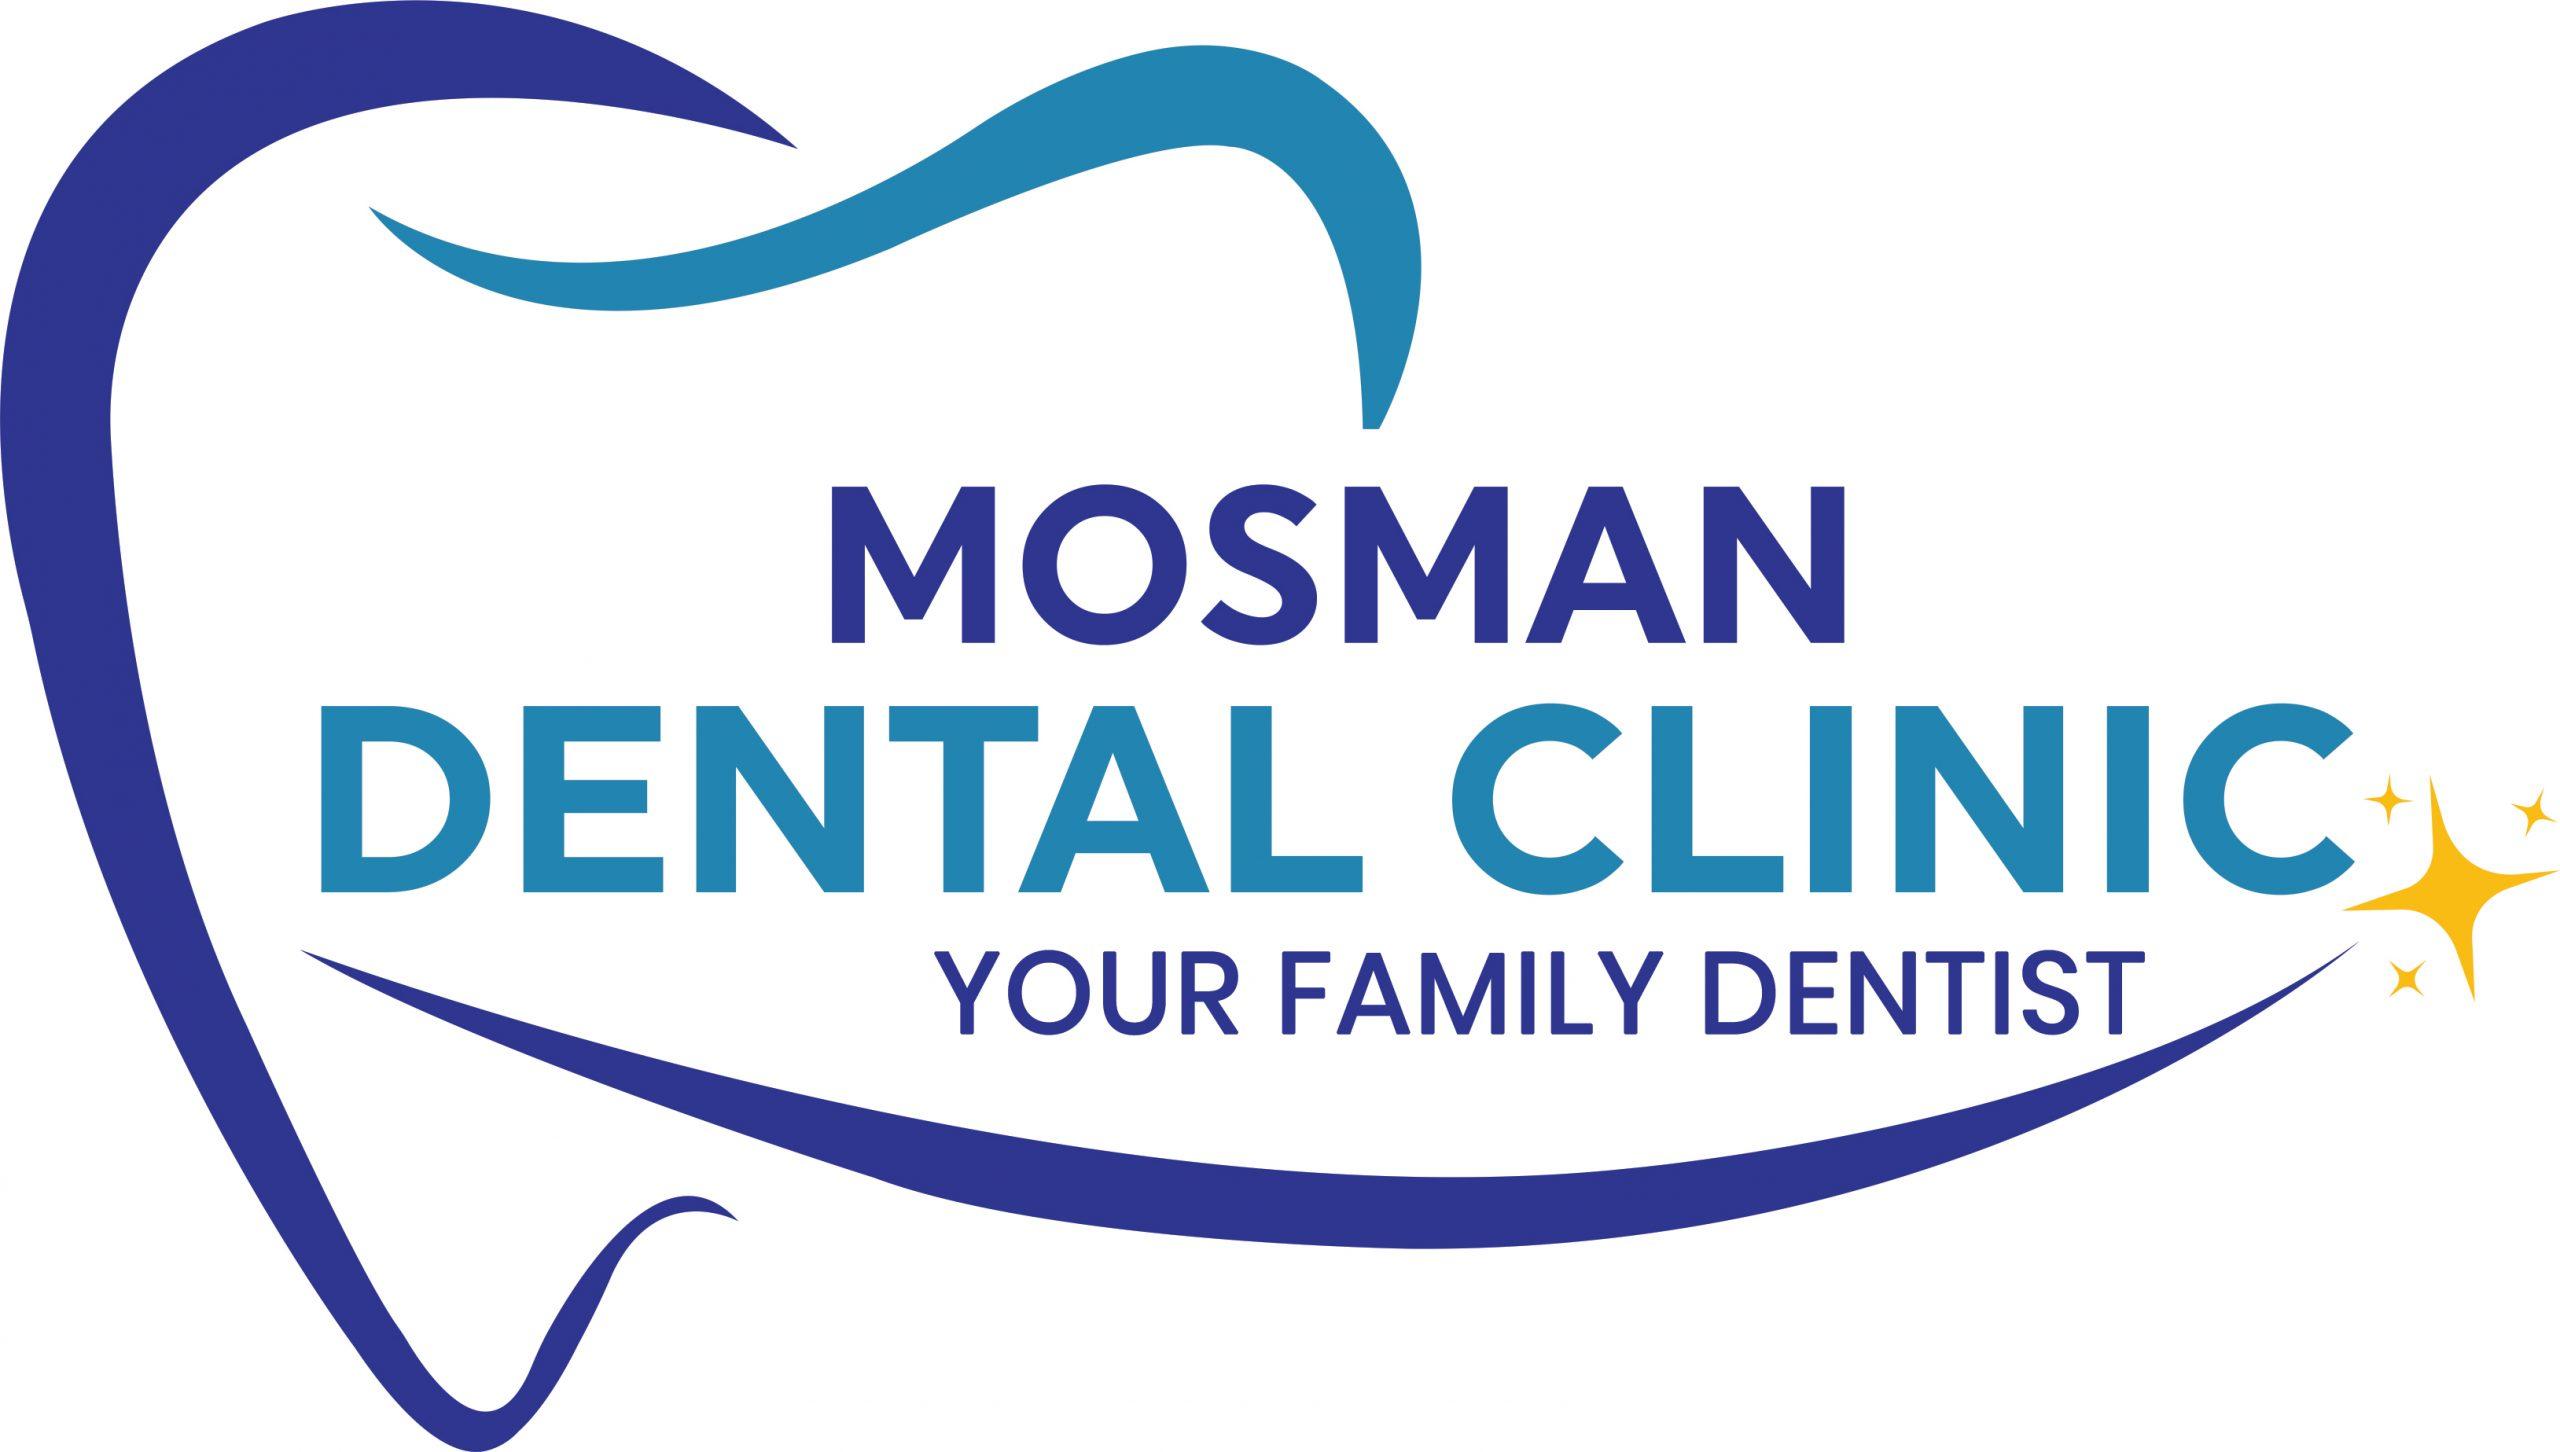 Mosman Dental Clinic